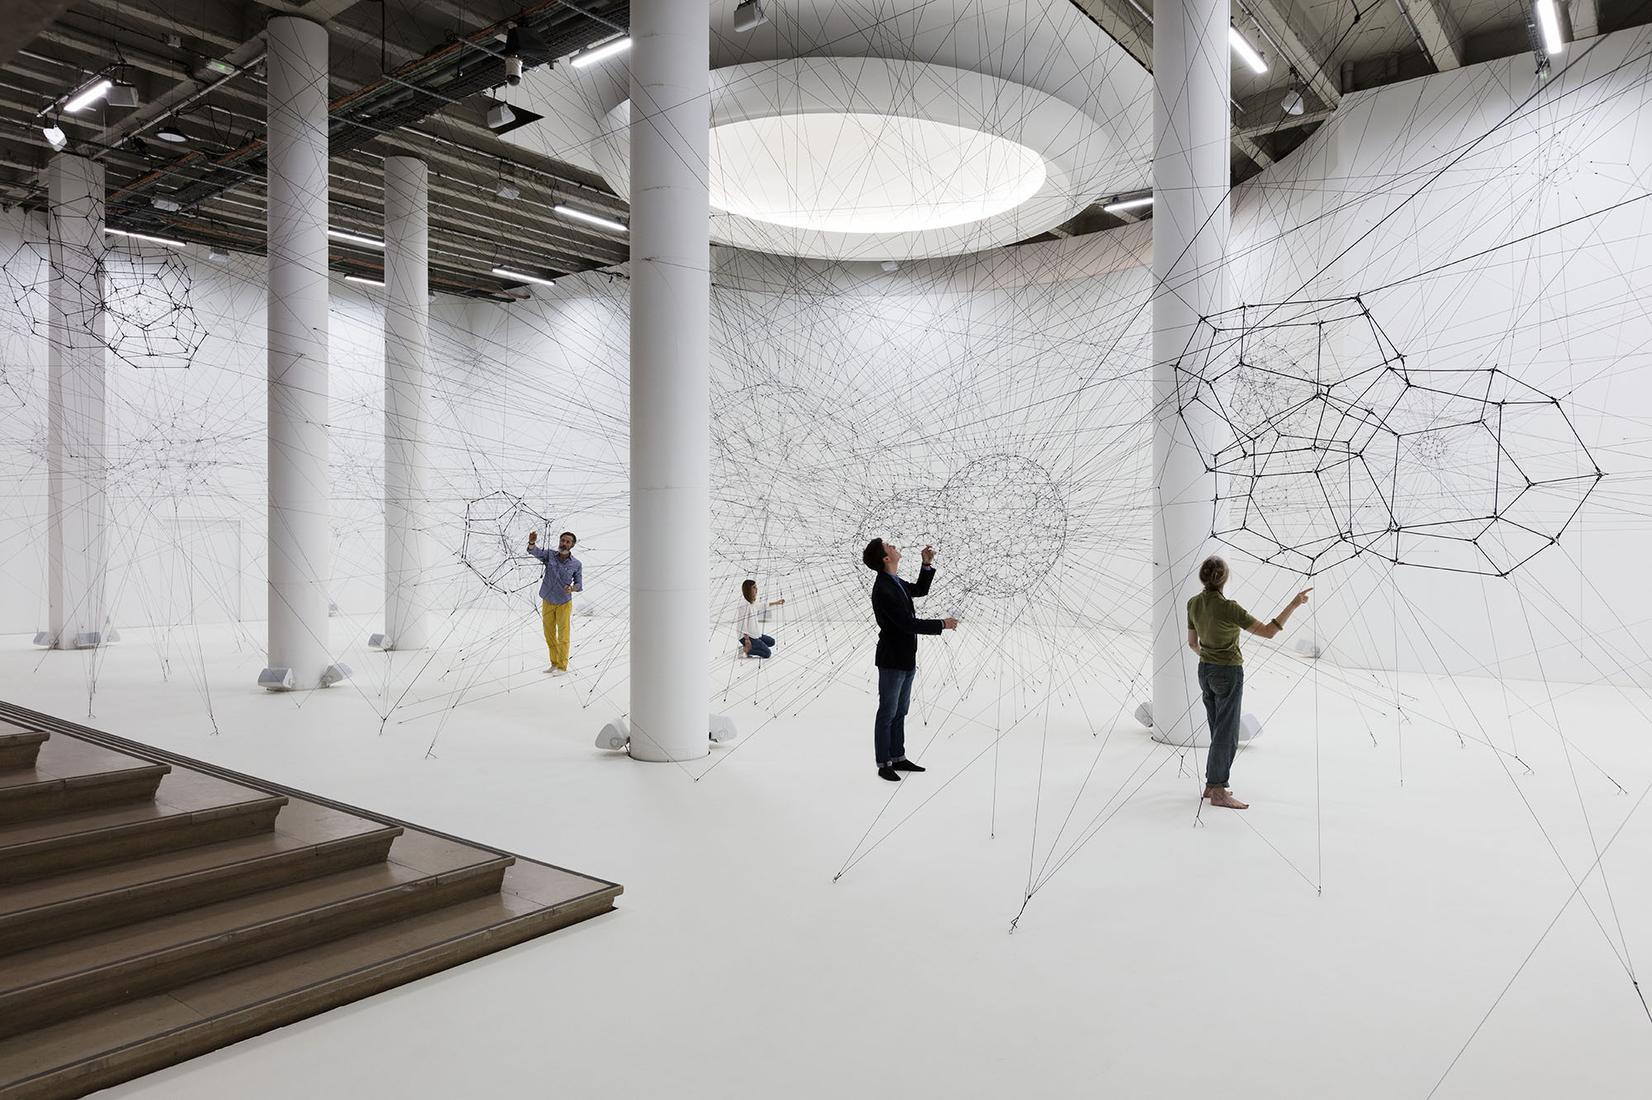 October 15, 2018 - January 6, 2019 - Palais de Tokyo, Paris - Tomás Saraceno: ON AIR - Exhibitions